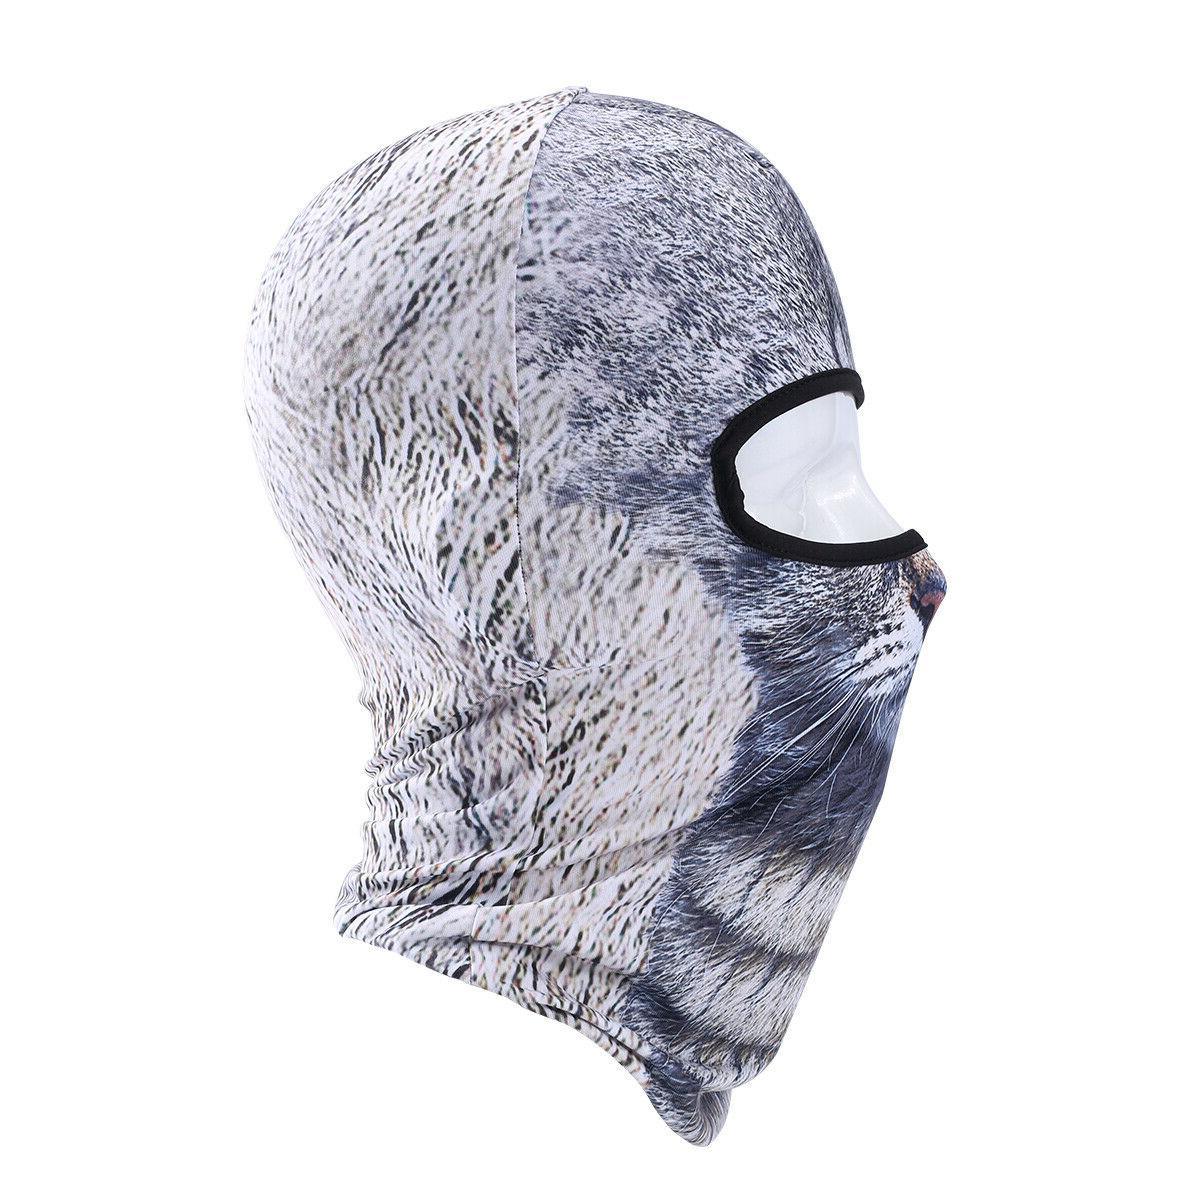 Cat Mask Cute Full Mask for Hiking Sports